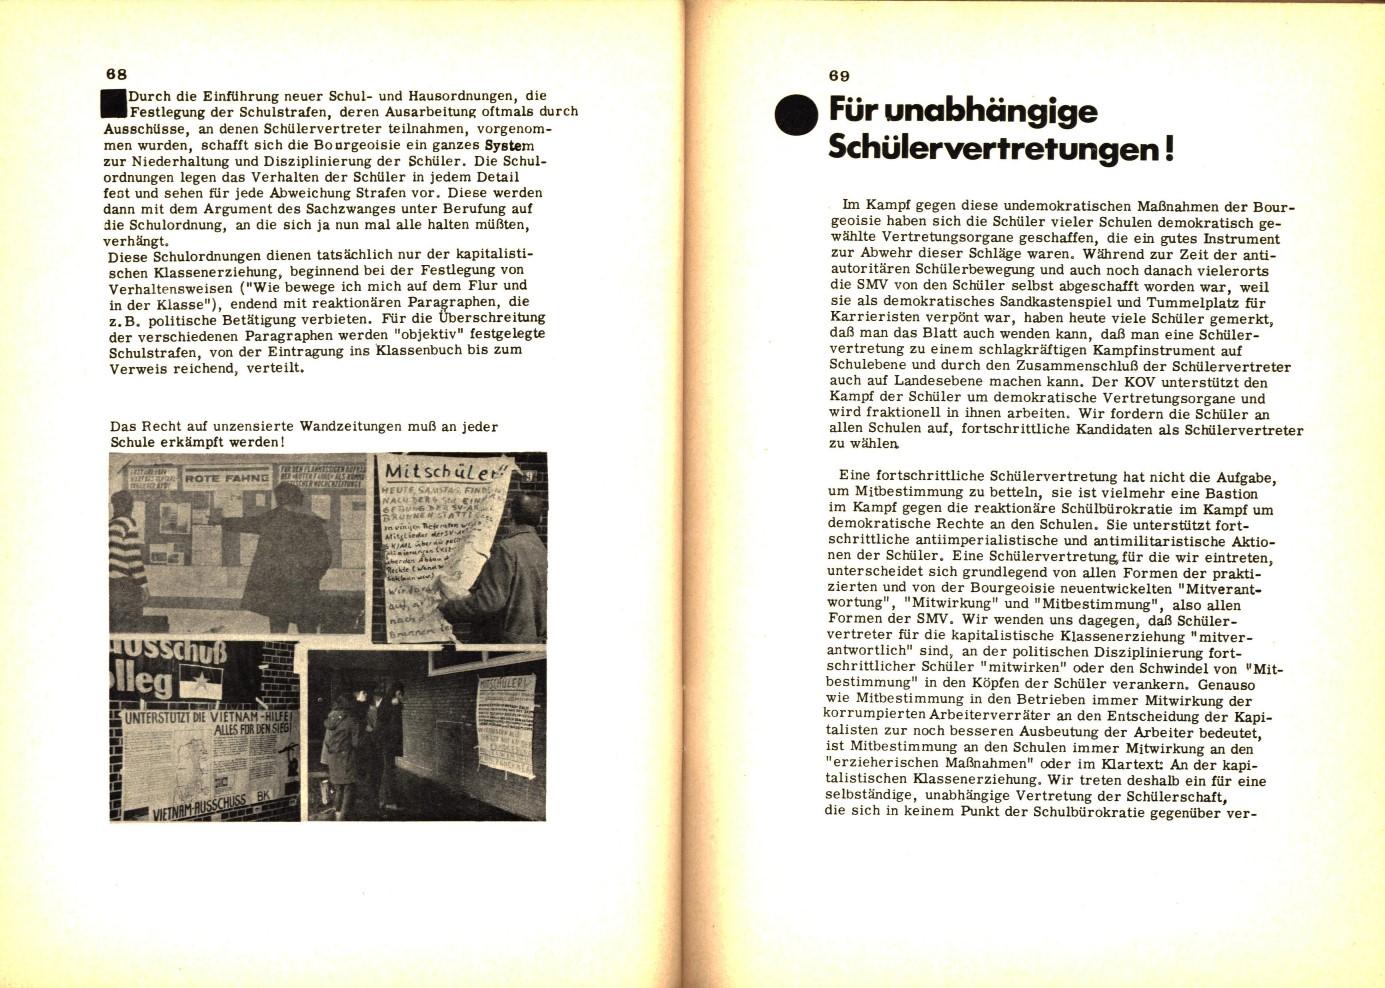 KOV_1973_Aktionsprogramm_37